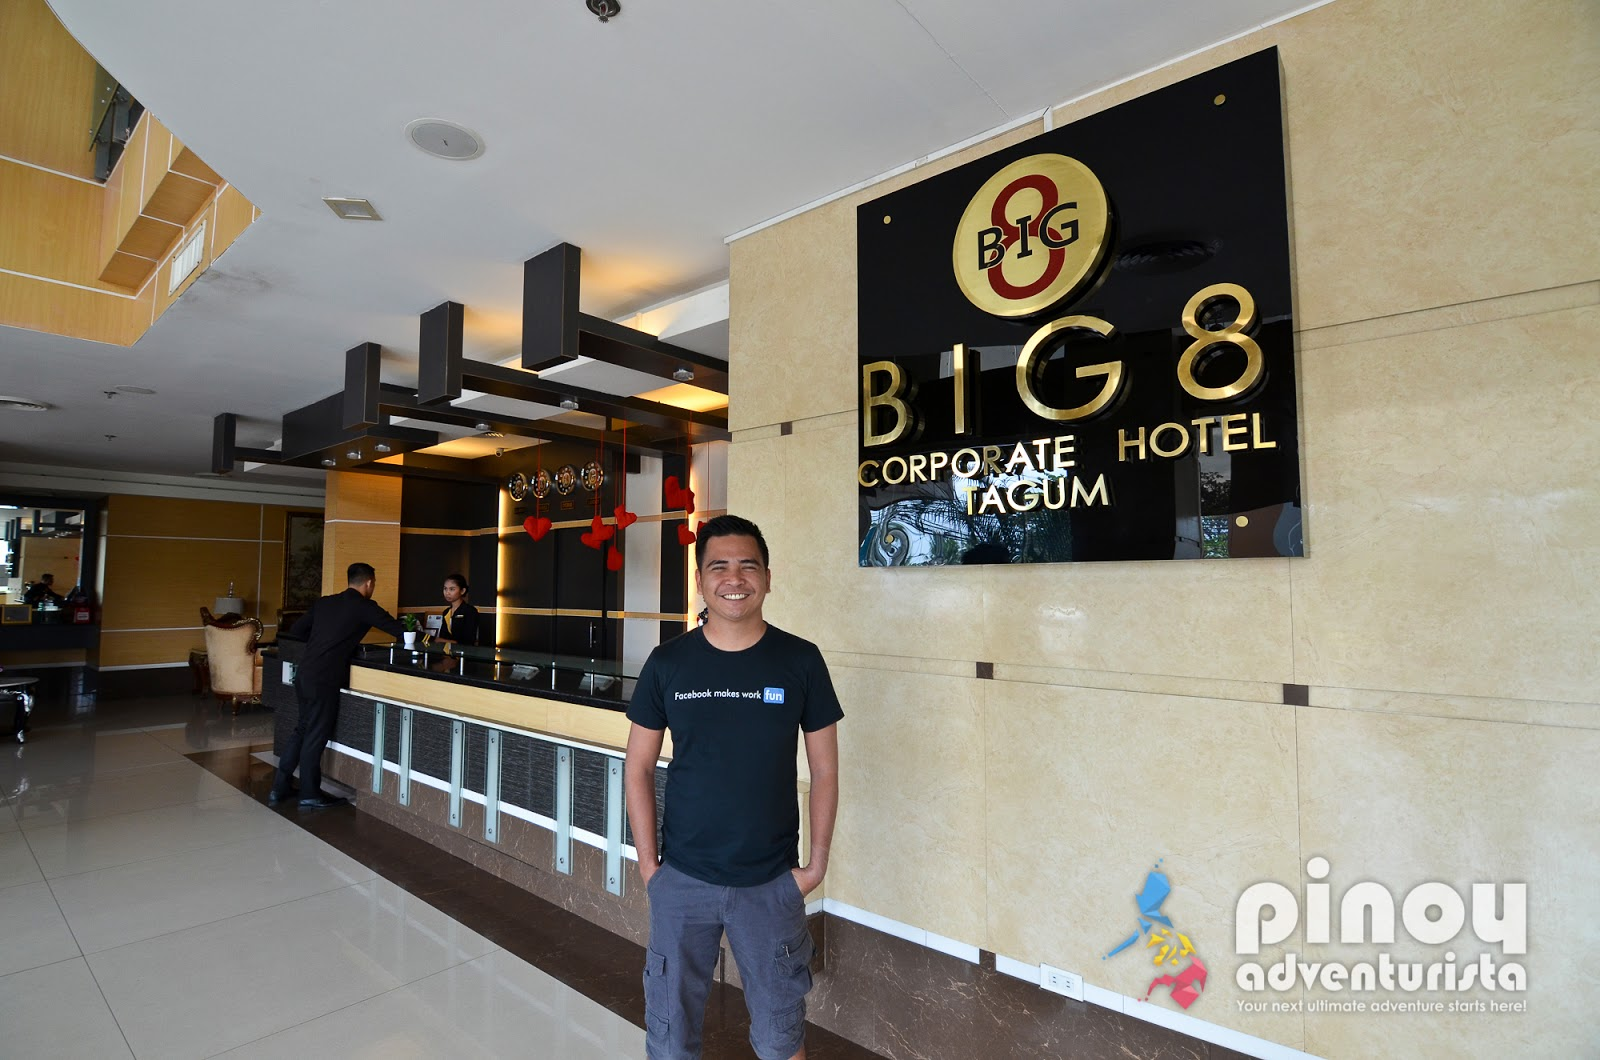 HOTEL REVIEW: Big 8 Corporate Hotel in Tagum City, Davao del Norte